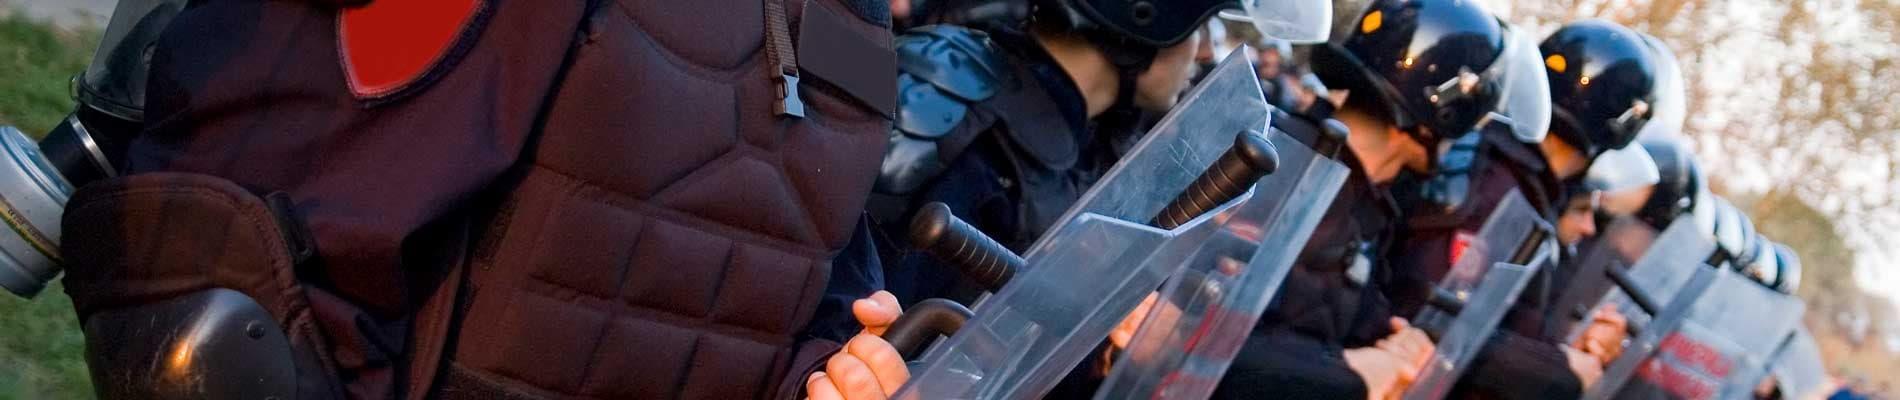 Policia nacional i guàrdia civil